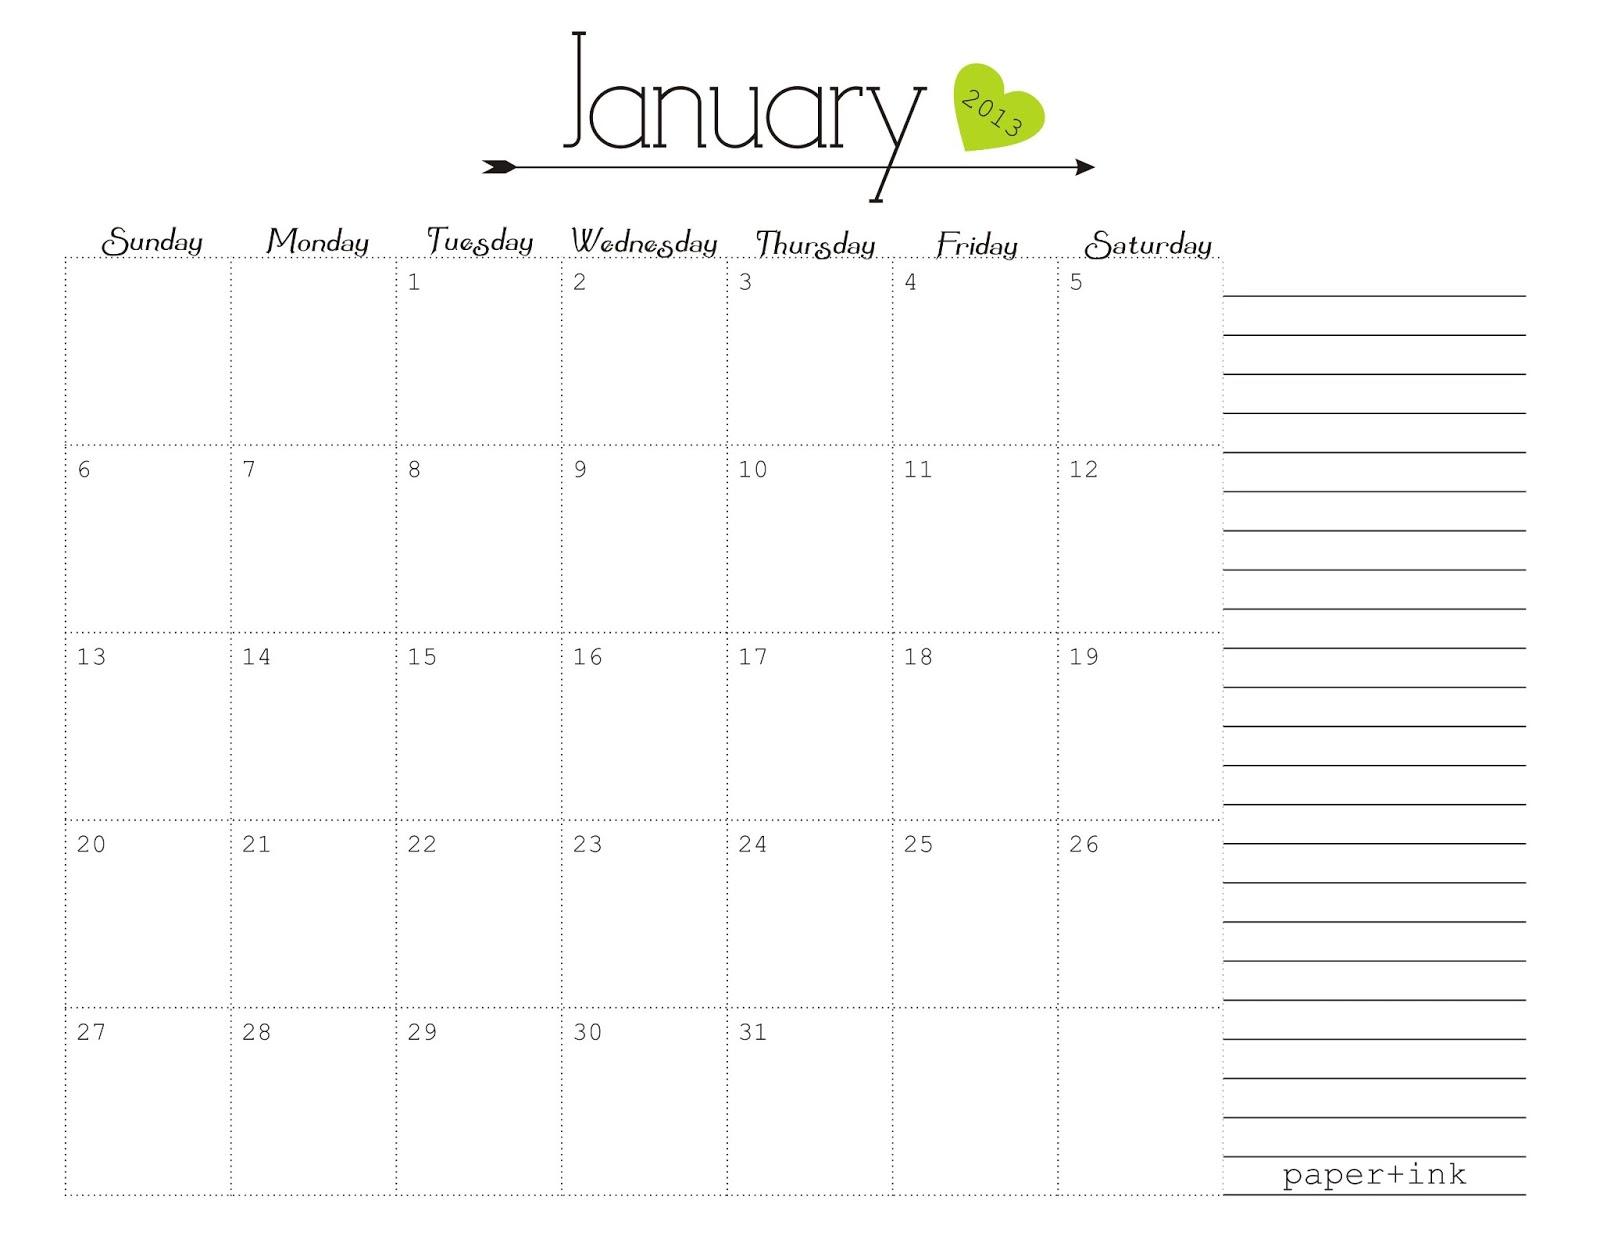 Free Printable Calendars: January 2013